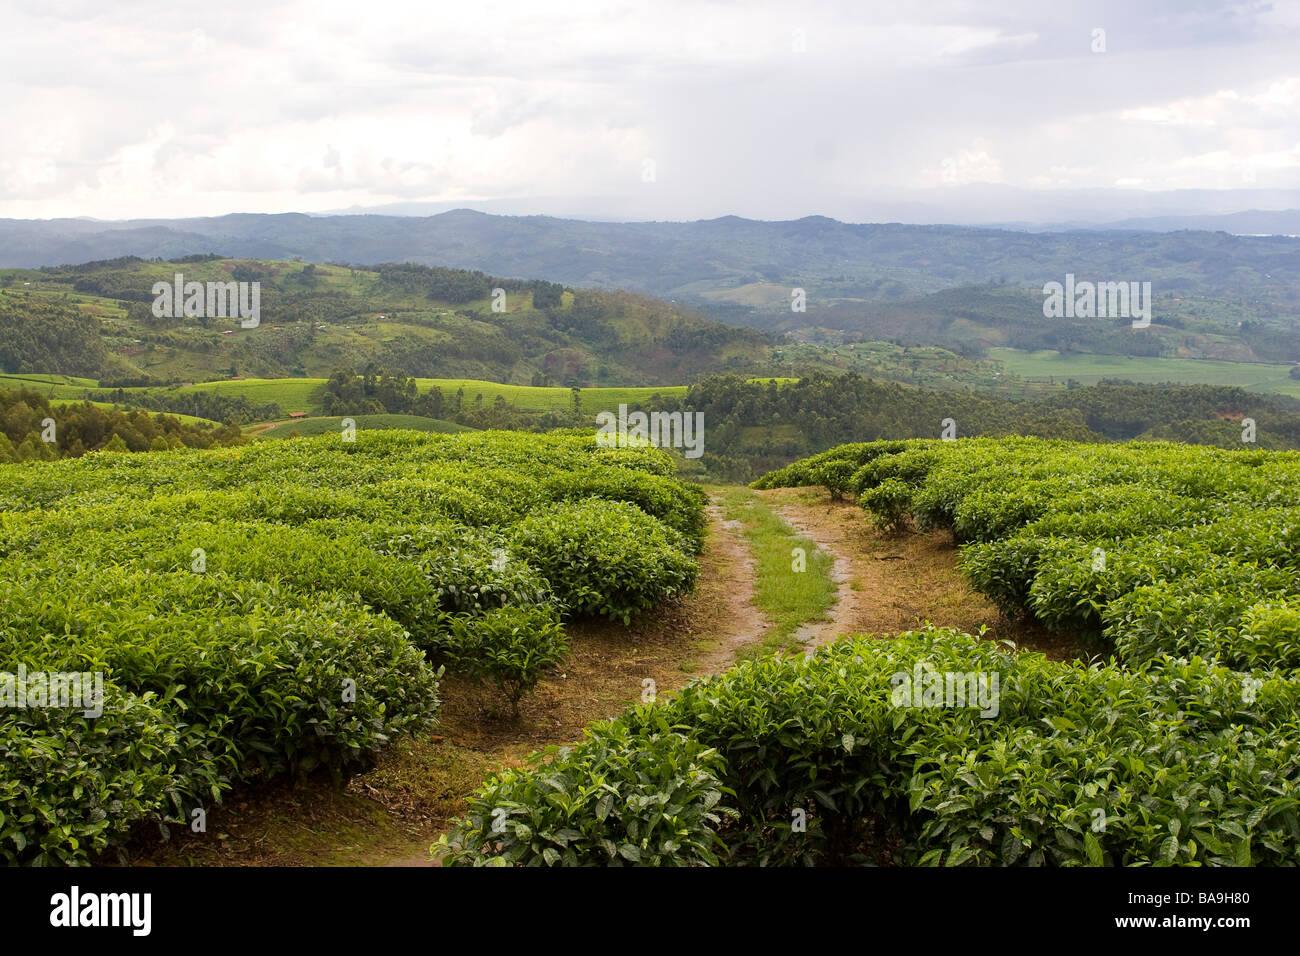 Tea Plantation, Gisakura, Rwanda - Stock Image